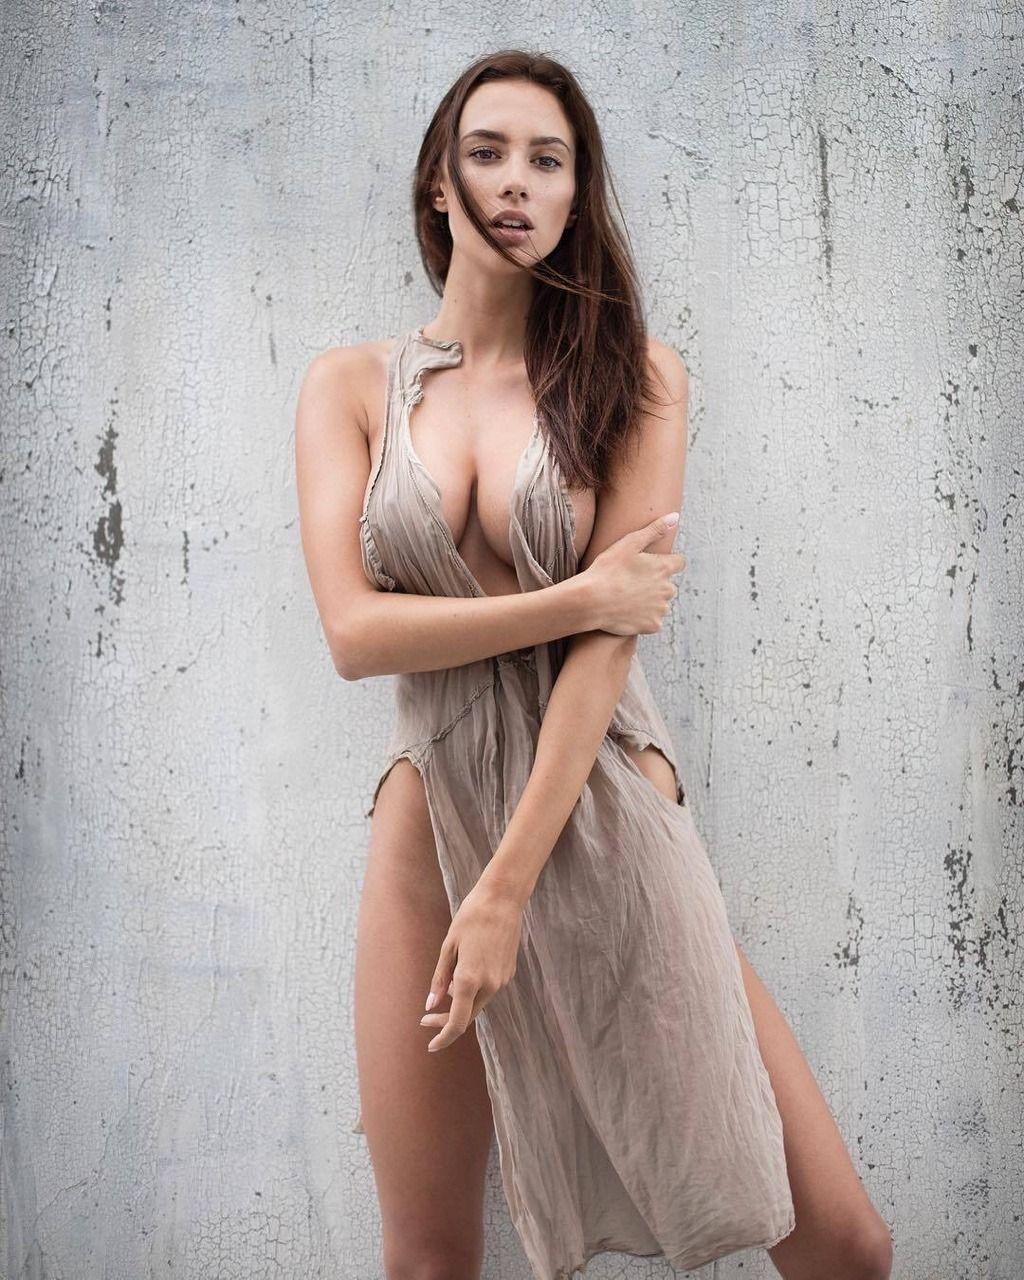 Boobs Mary Leest nudes (92 photos), Topless, Is a cute, Feet, lingerie 2006